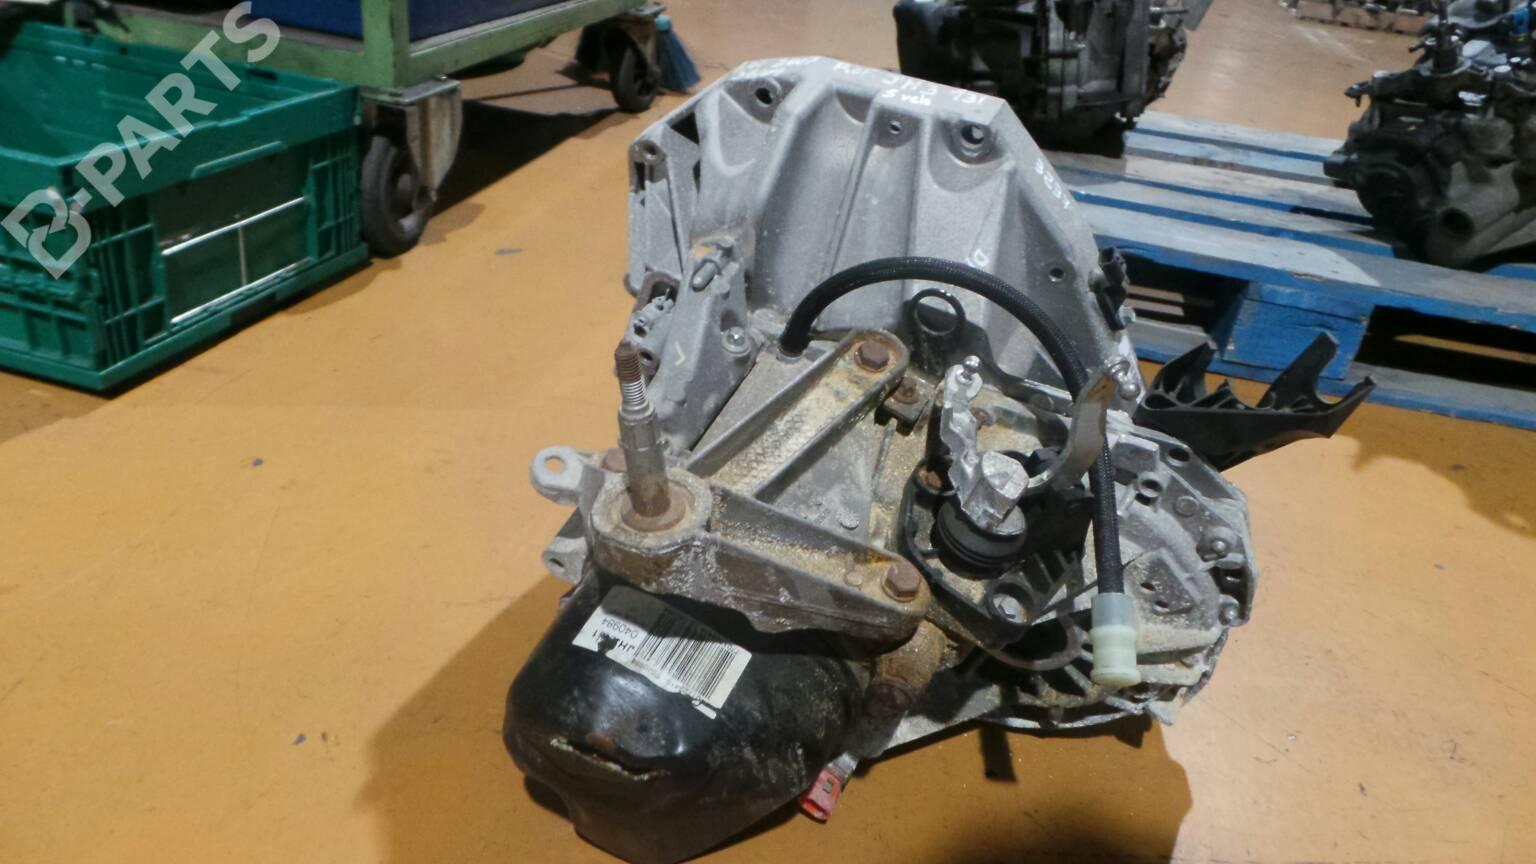 manual gearbox renault clio iii br0 1 cr0 1 1 4 16v 32373 rh b parts com Renault Clio Interior Renault Clio Sport